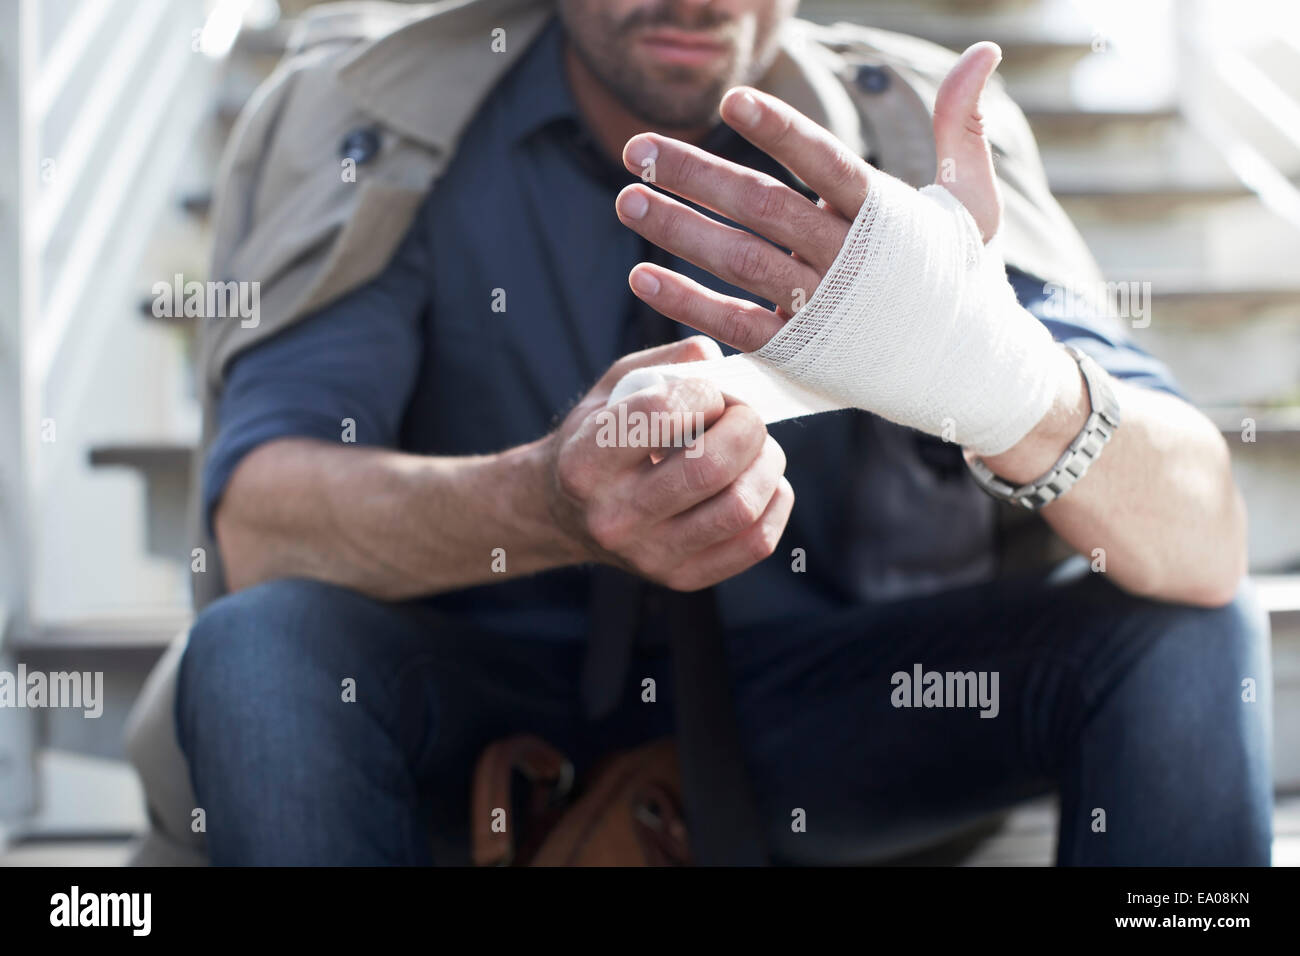 Homme de main bandage on staircase Banque D'Images